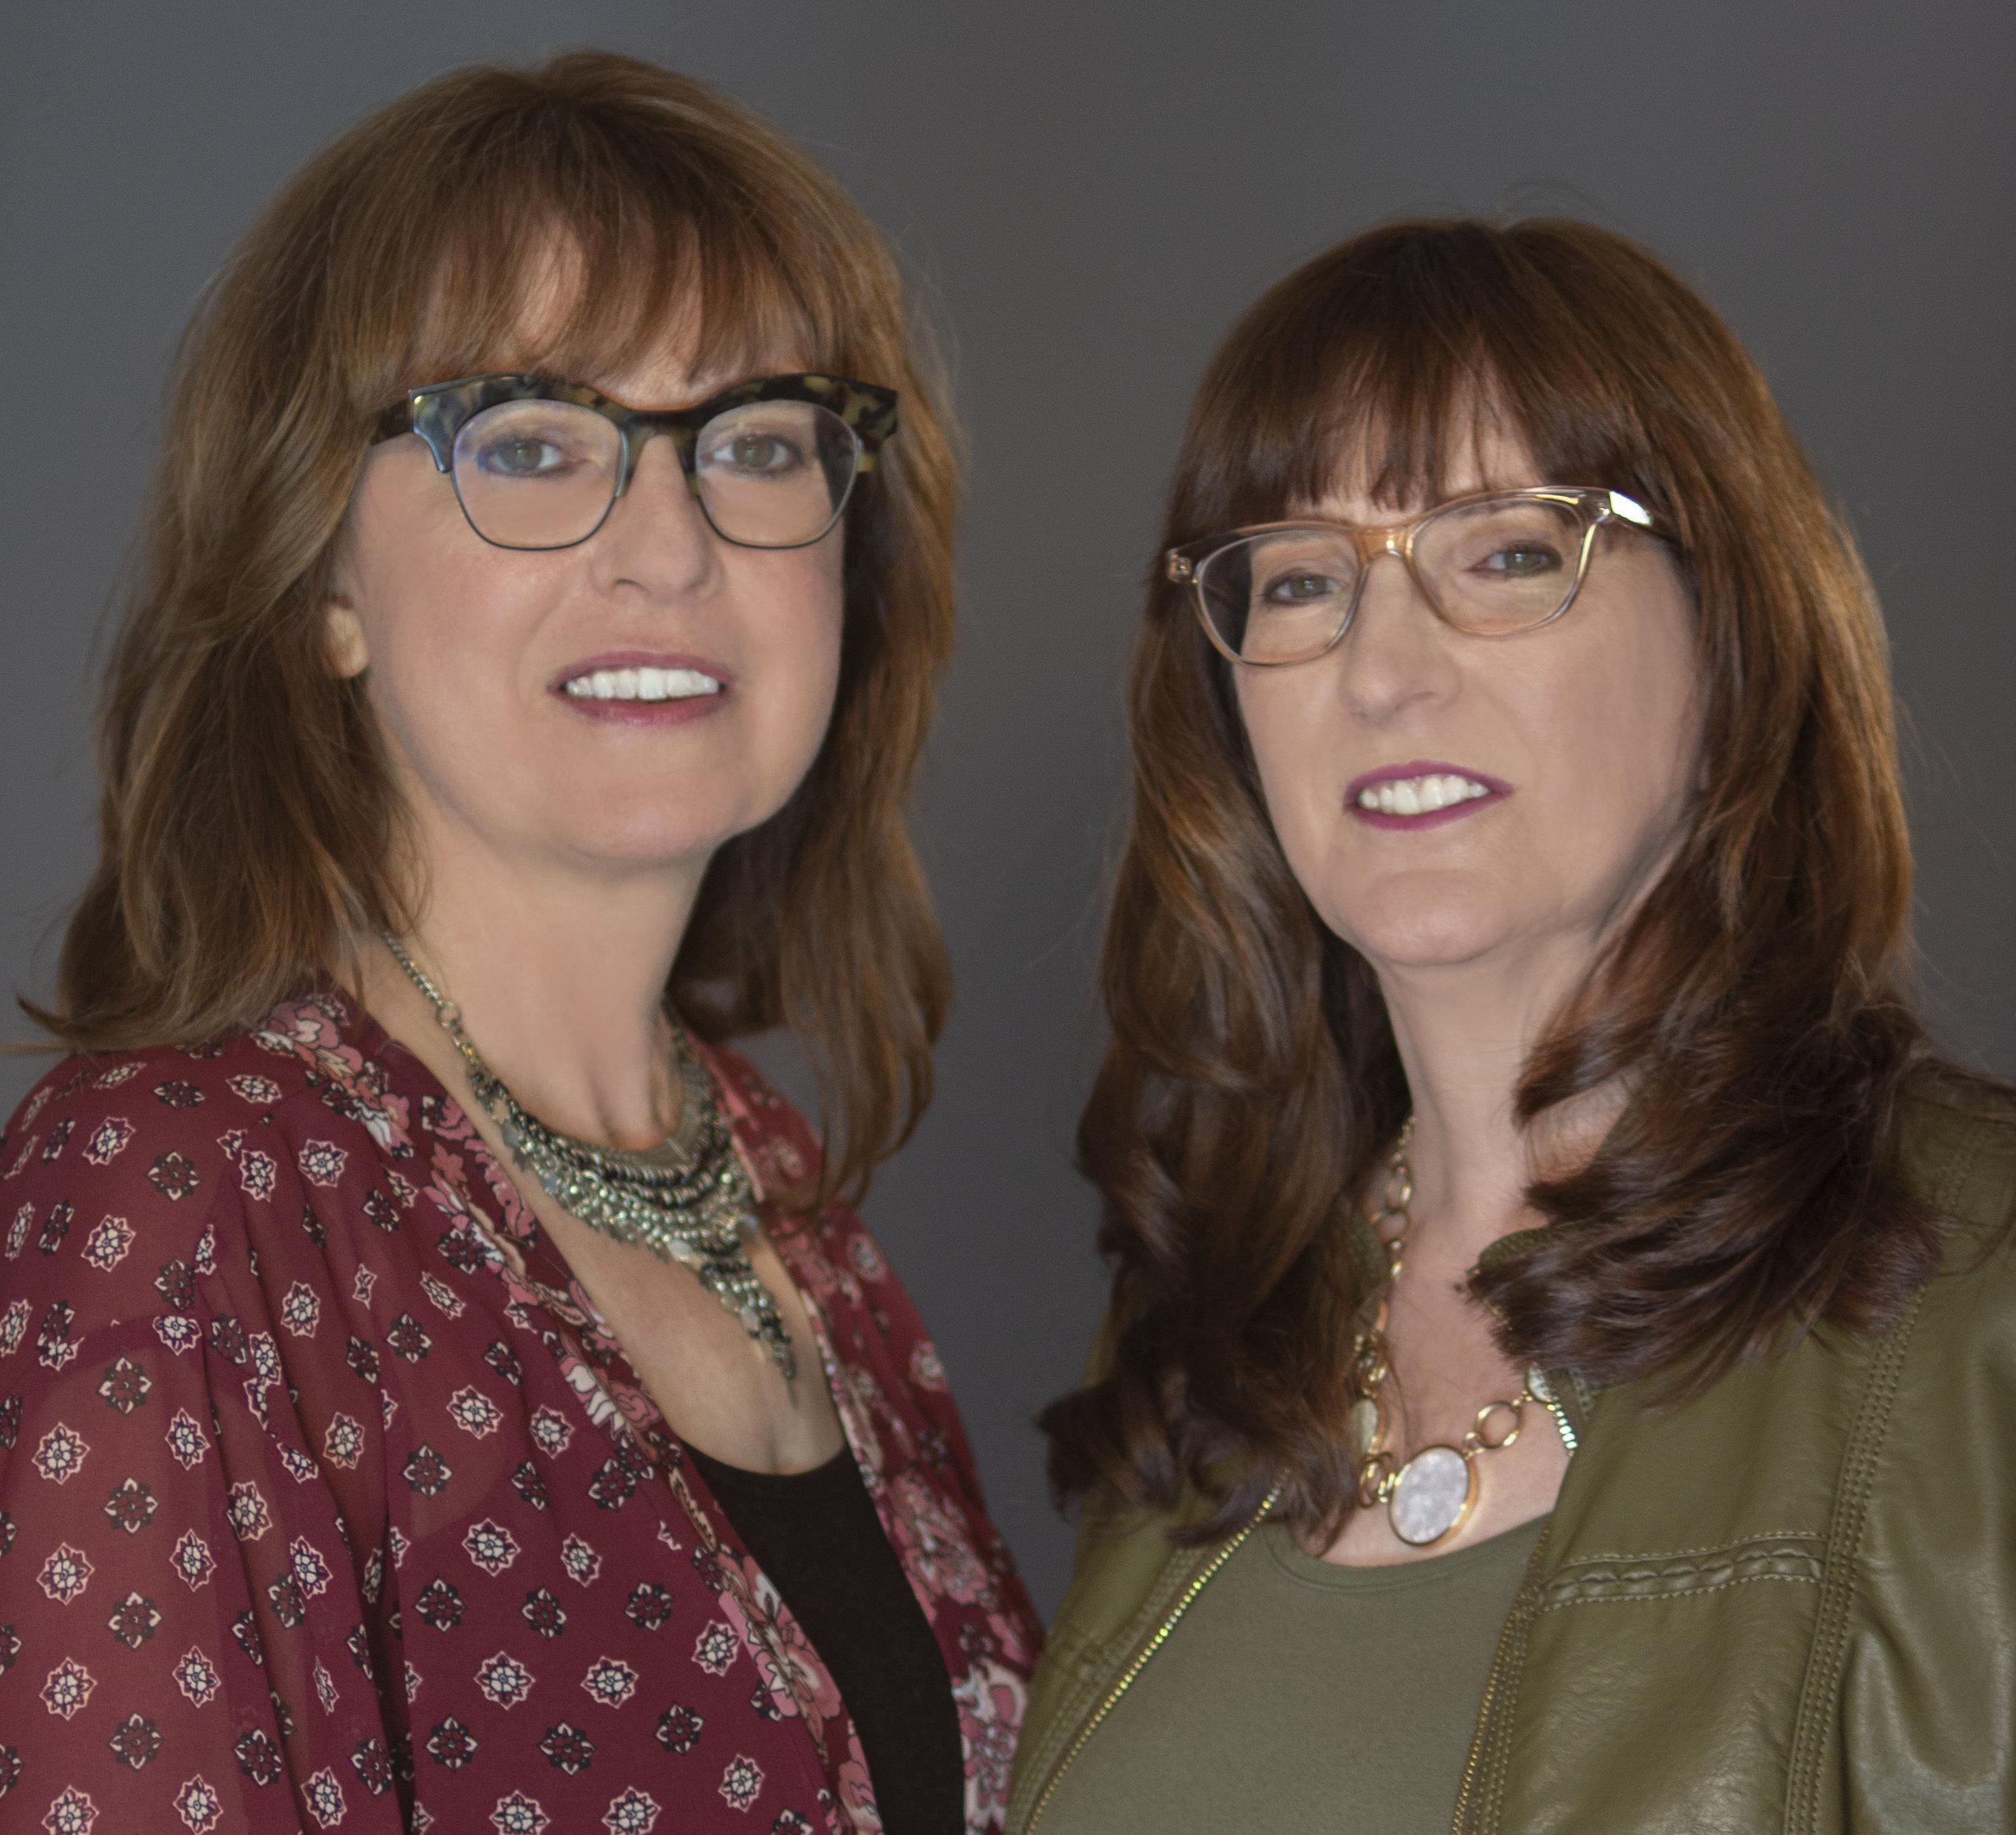 Amy_and_Nancy_Harrington_Photo by Reid Waterer 2.jpg